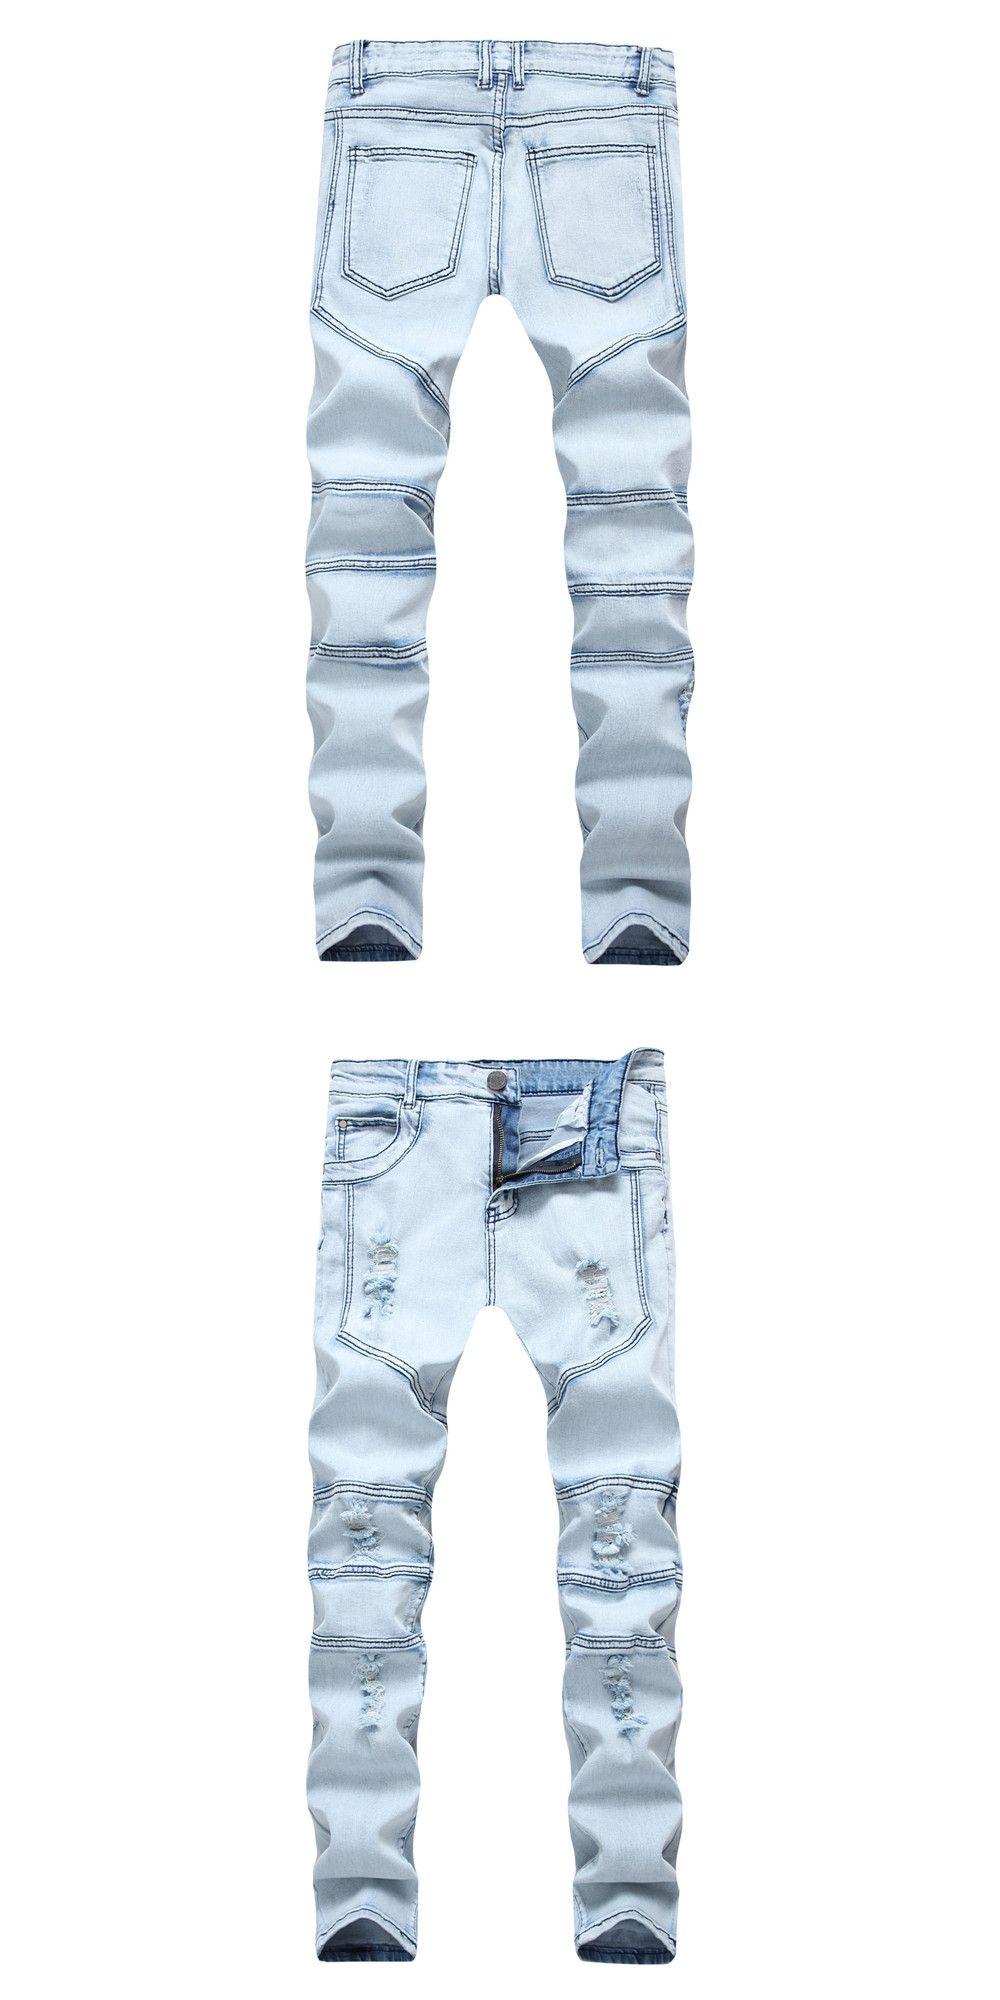 d06bba13f2a 2018 New Dropshipping Mens Ripped Biker Jeans Men Cotton blue Slim Fit  Motorcycle Jeans Men s Skinny Hole Denim Pants Plus Size